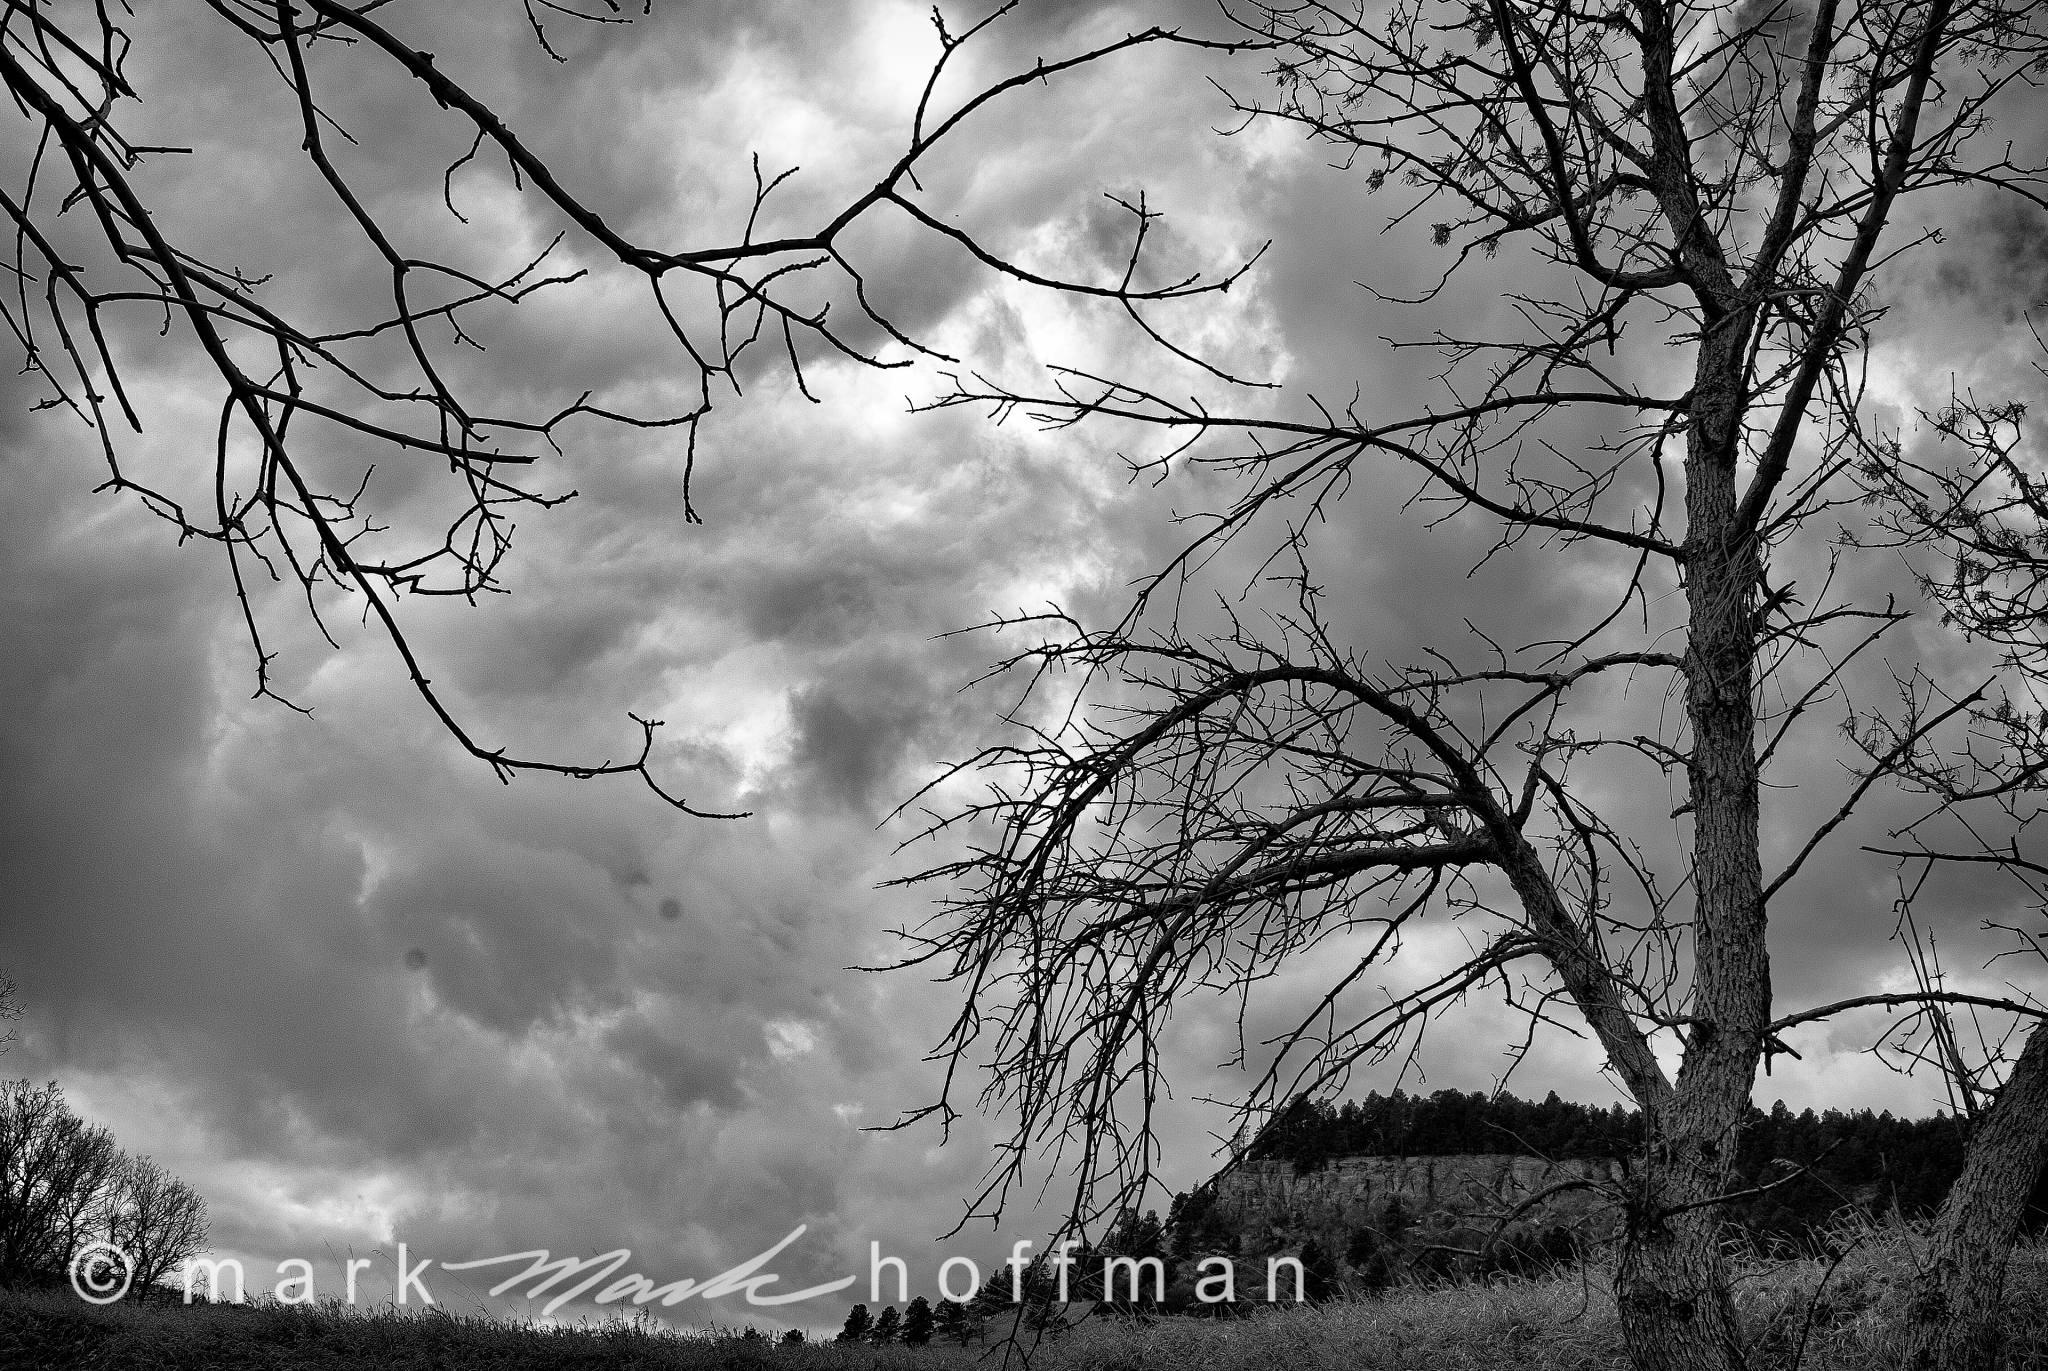 Mark_Hoffman_ND25826_Edit_cap1_var1.jpg